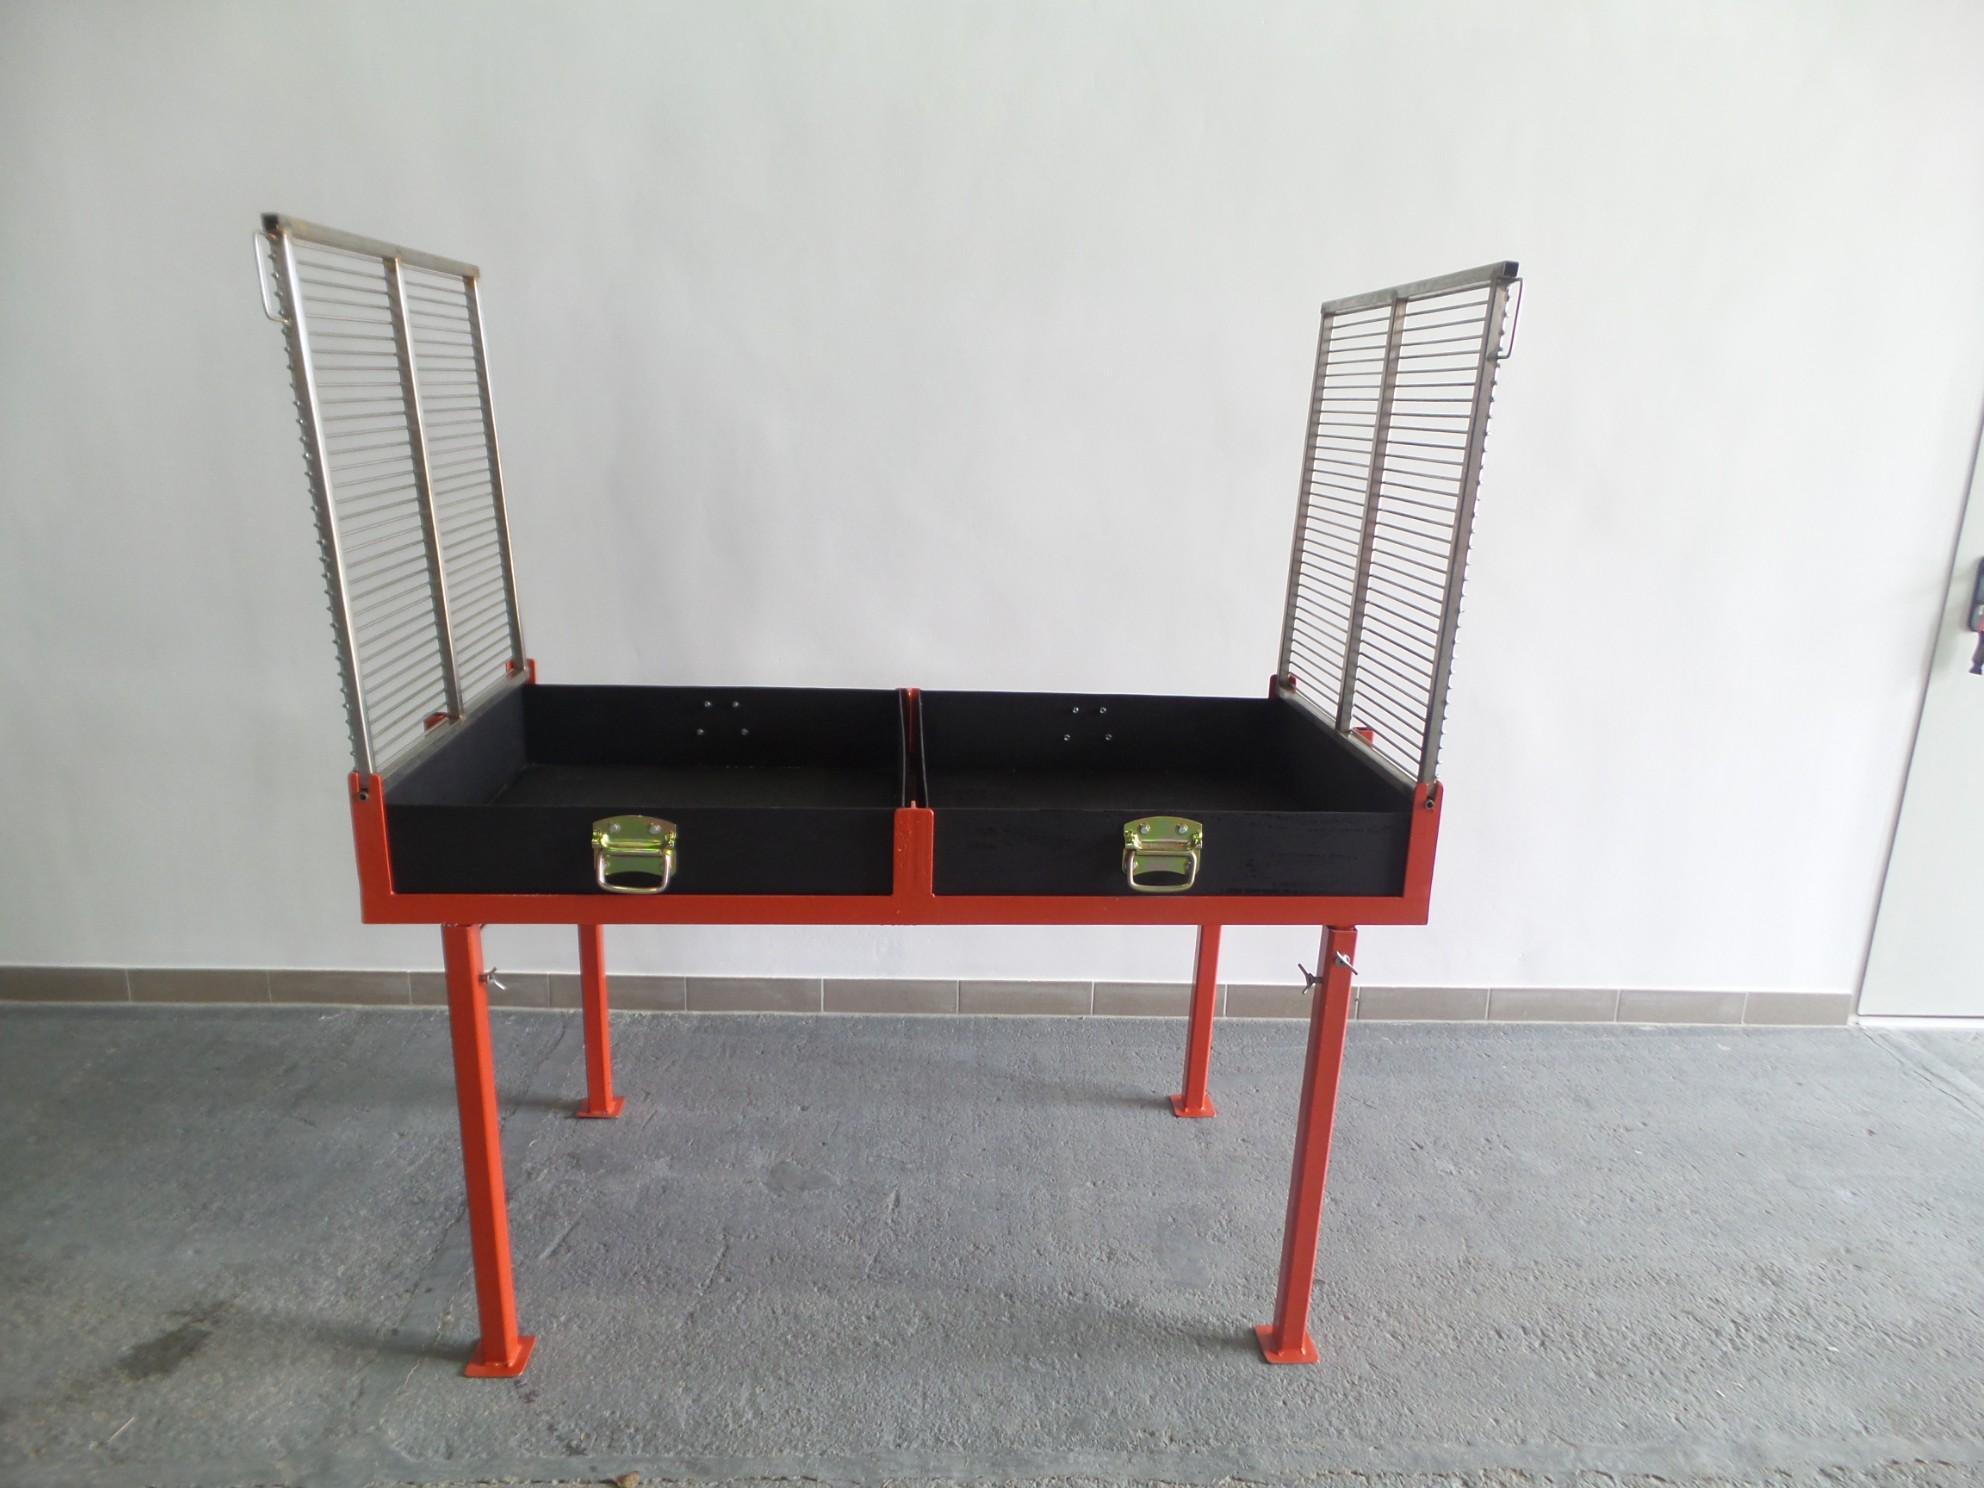 holzkohlegrill kaufen gastro grill f r profi events. Black Bedroom Furniture Sets. Home Design Ideas